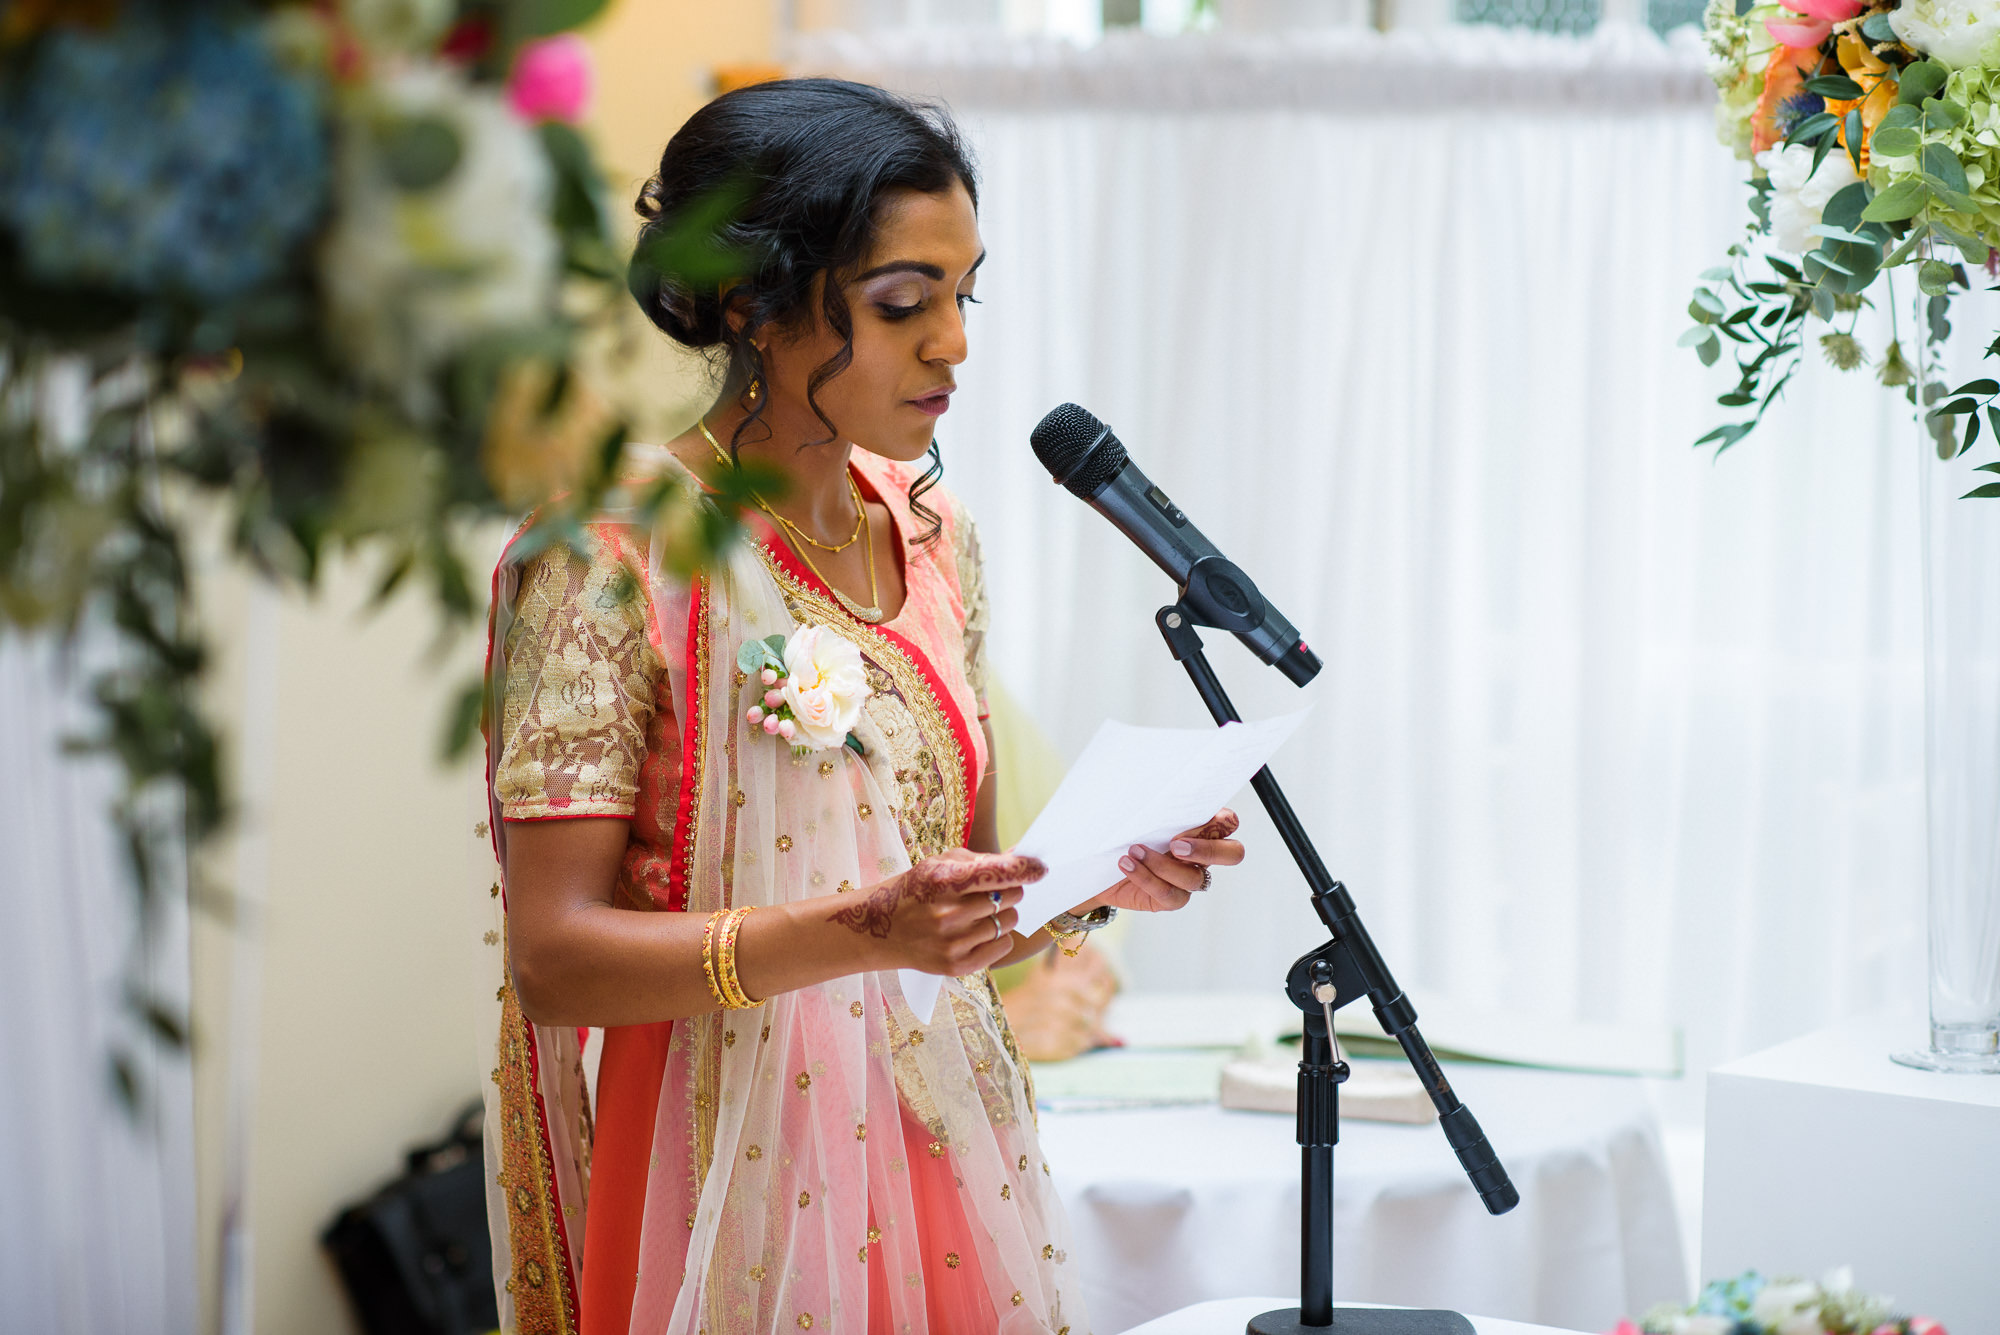 Pembroke lodge indian wedding ceremony